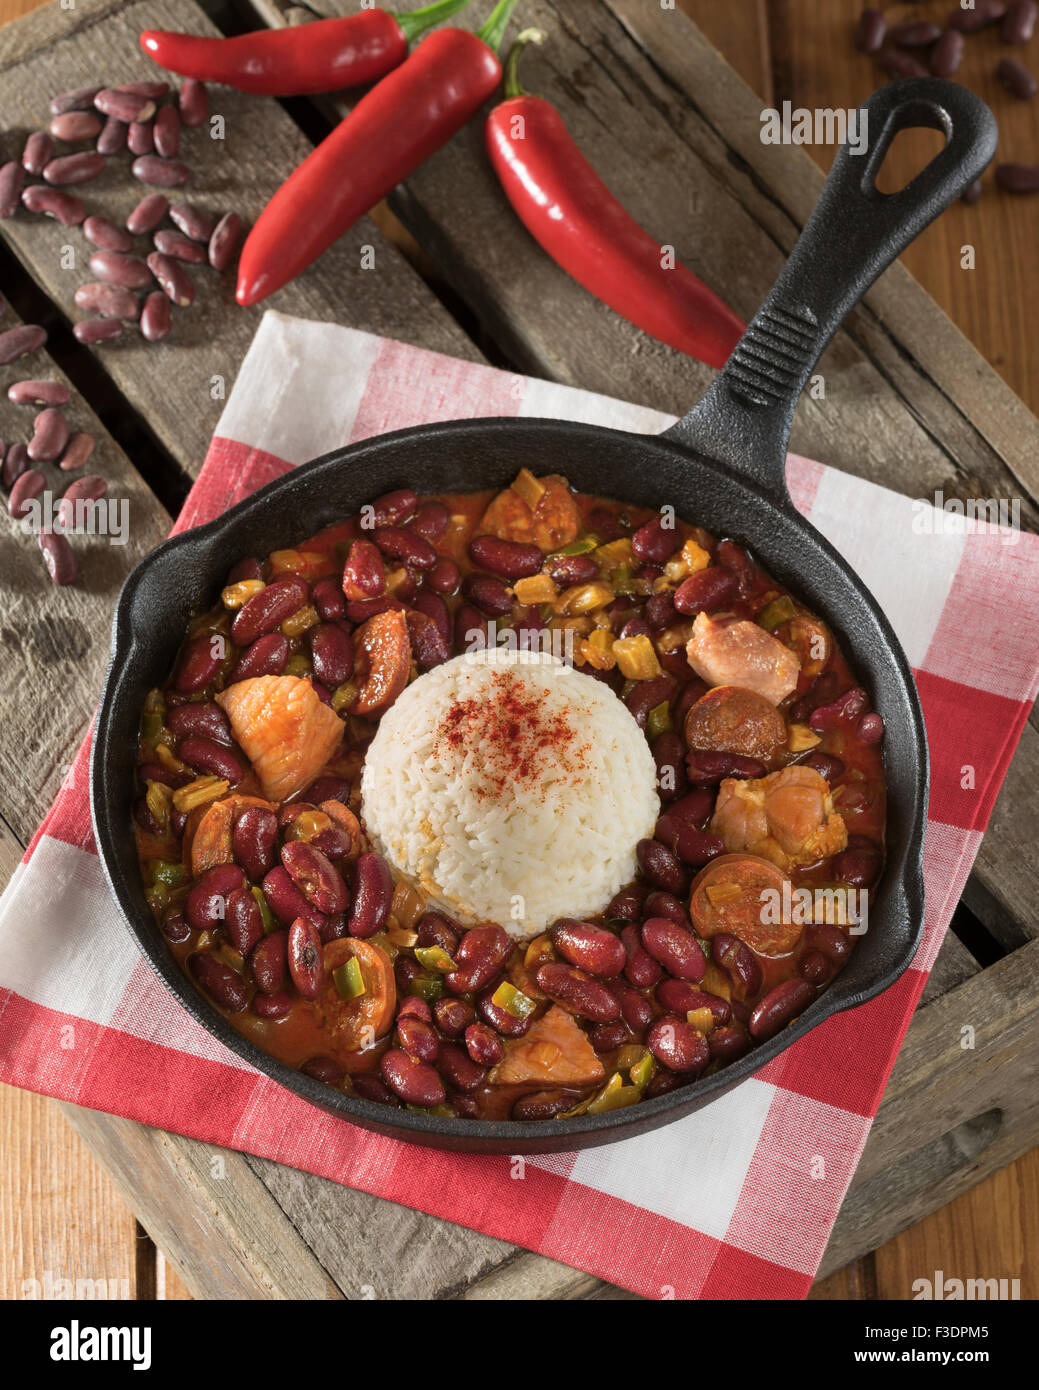 Kreolische Küche München | Kreolische Kuche Munchen Kreolisch Kochen Kochkurse